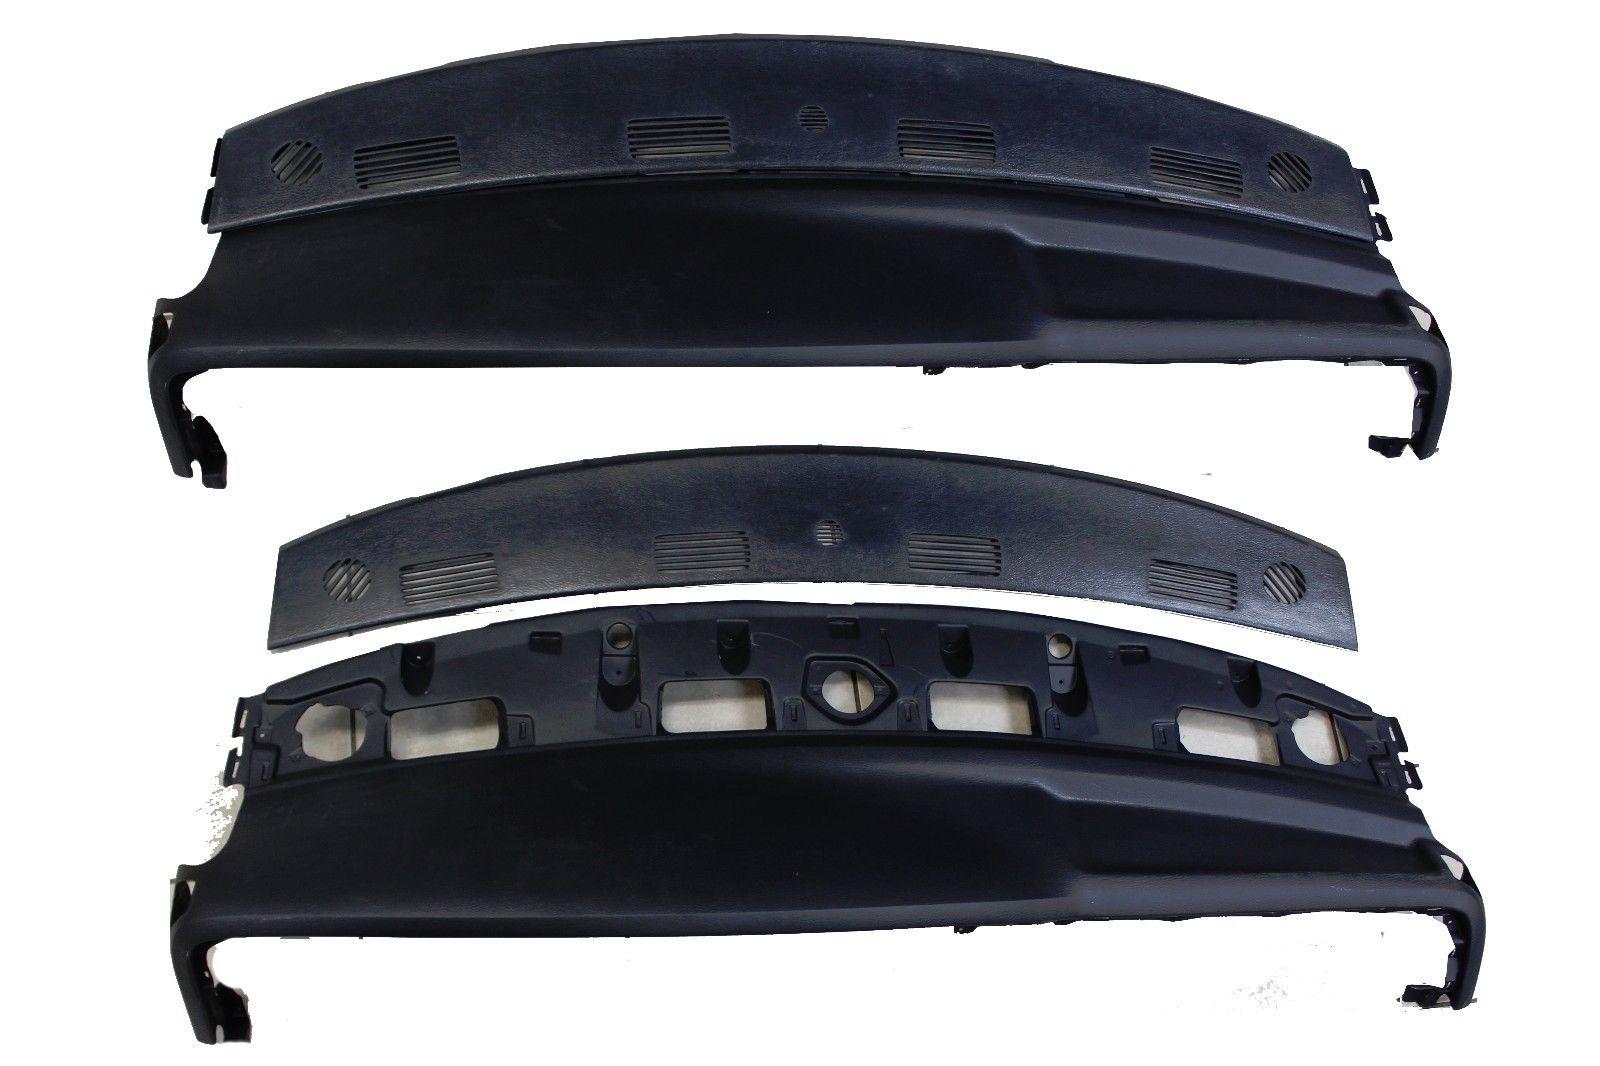 02 05 Fits Dodge Ram 1500 Dashboard Fibergl Replacement